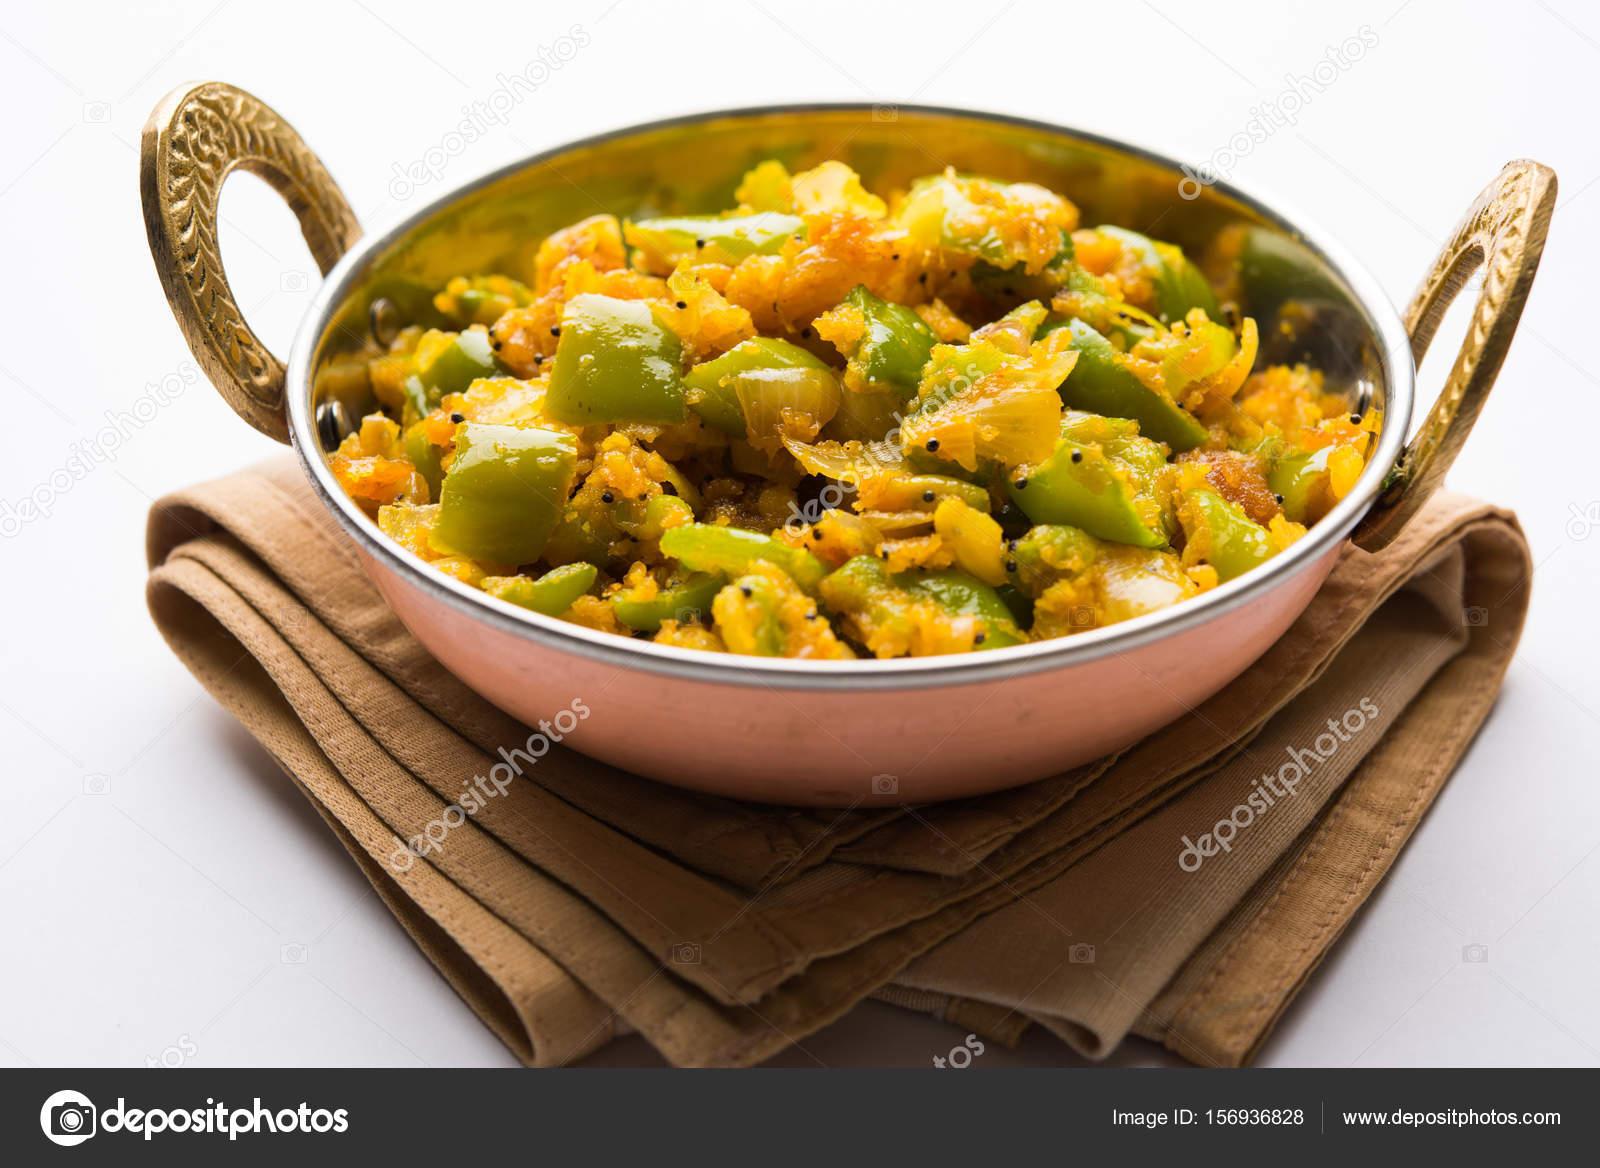 Shimla mirch sabji or simla mirch sabzi or spicy capsicum indian shimla mirch sabji or simla mirch sabzi or spicy capsicum indian food or vegetable recipe using forumfinder Gallery